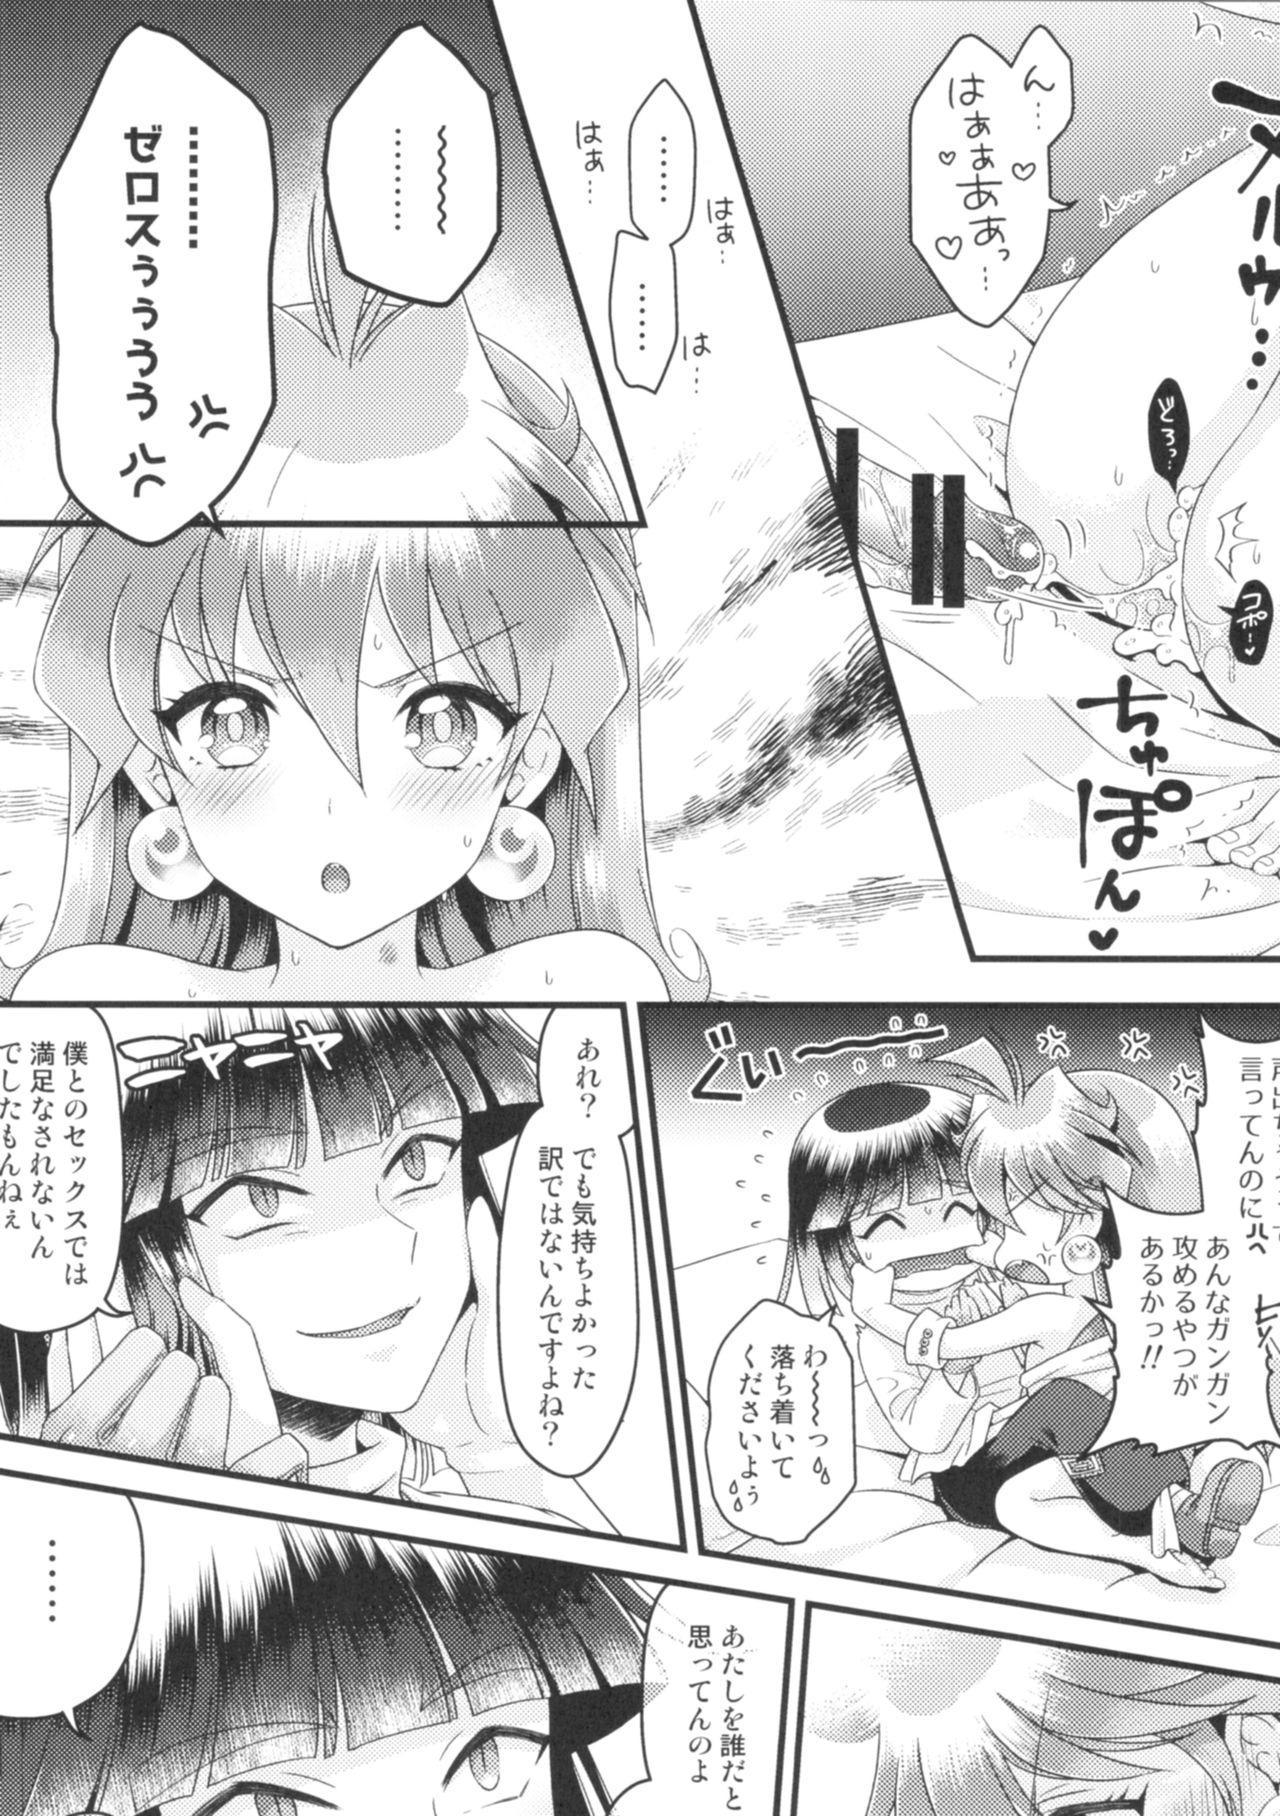 Lina Inverse Juu Shinkan ni NTR Love Love Ochi 26